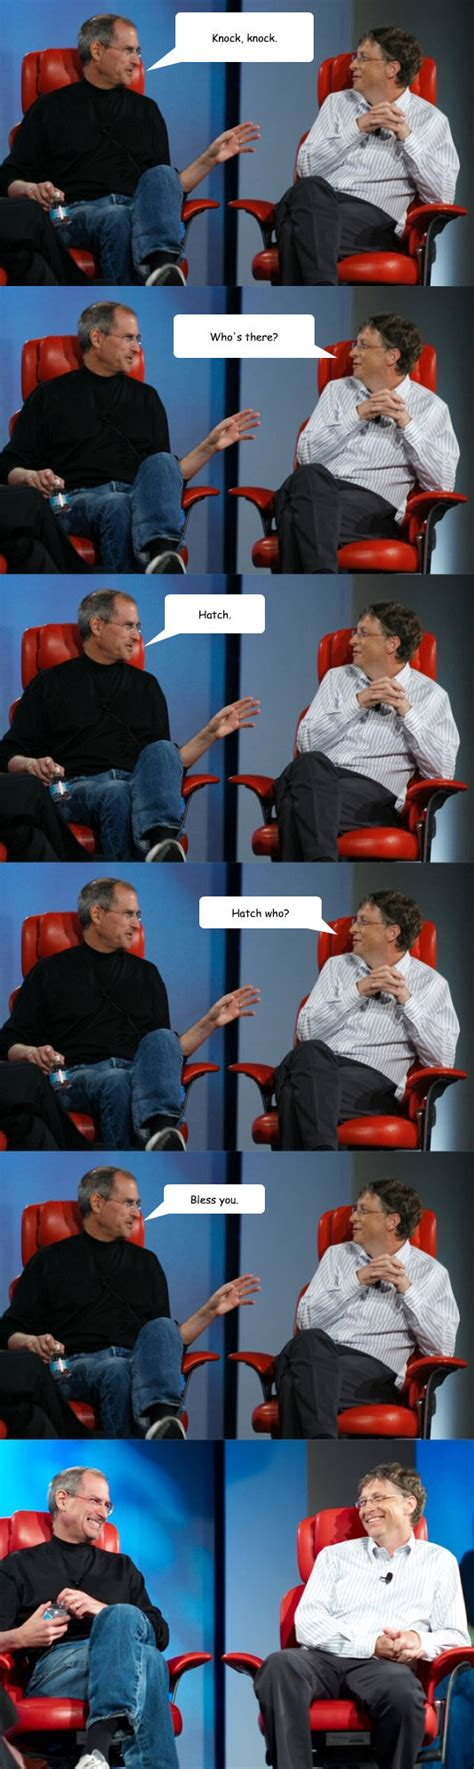 Steve Jobs Bill Gates Meme - steve jobs and bill gates meme weknowmemes